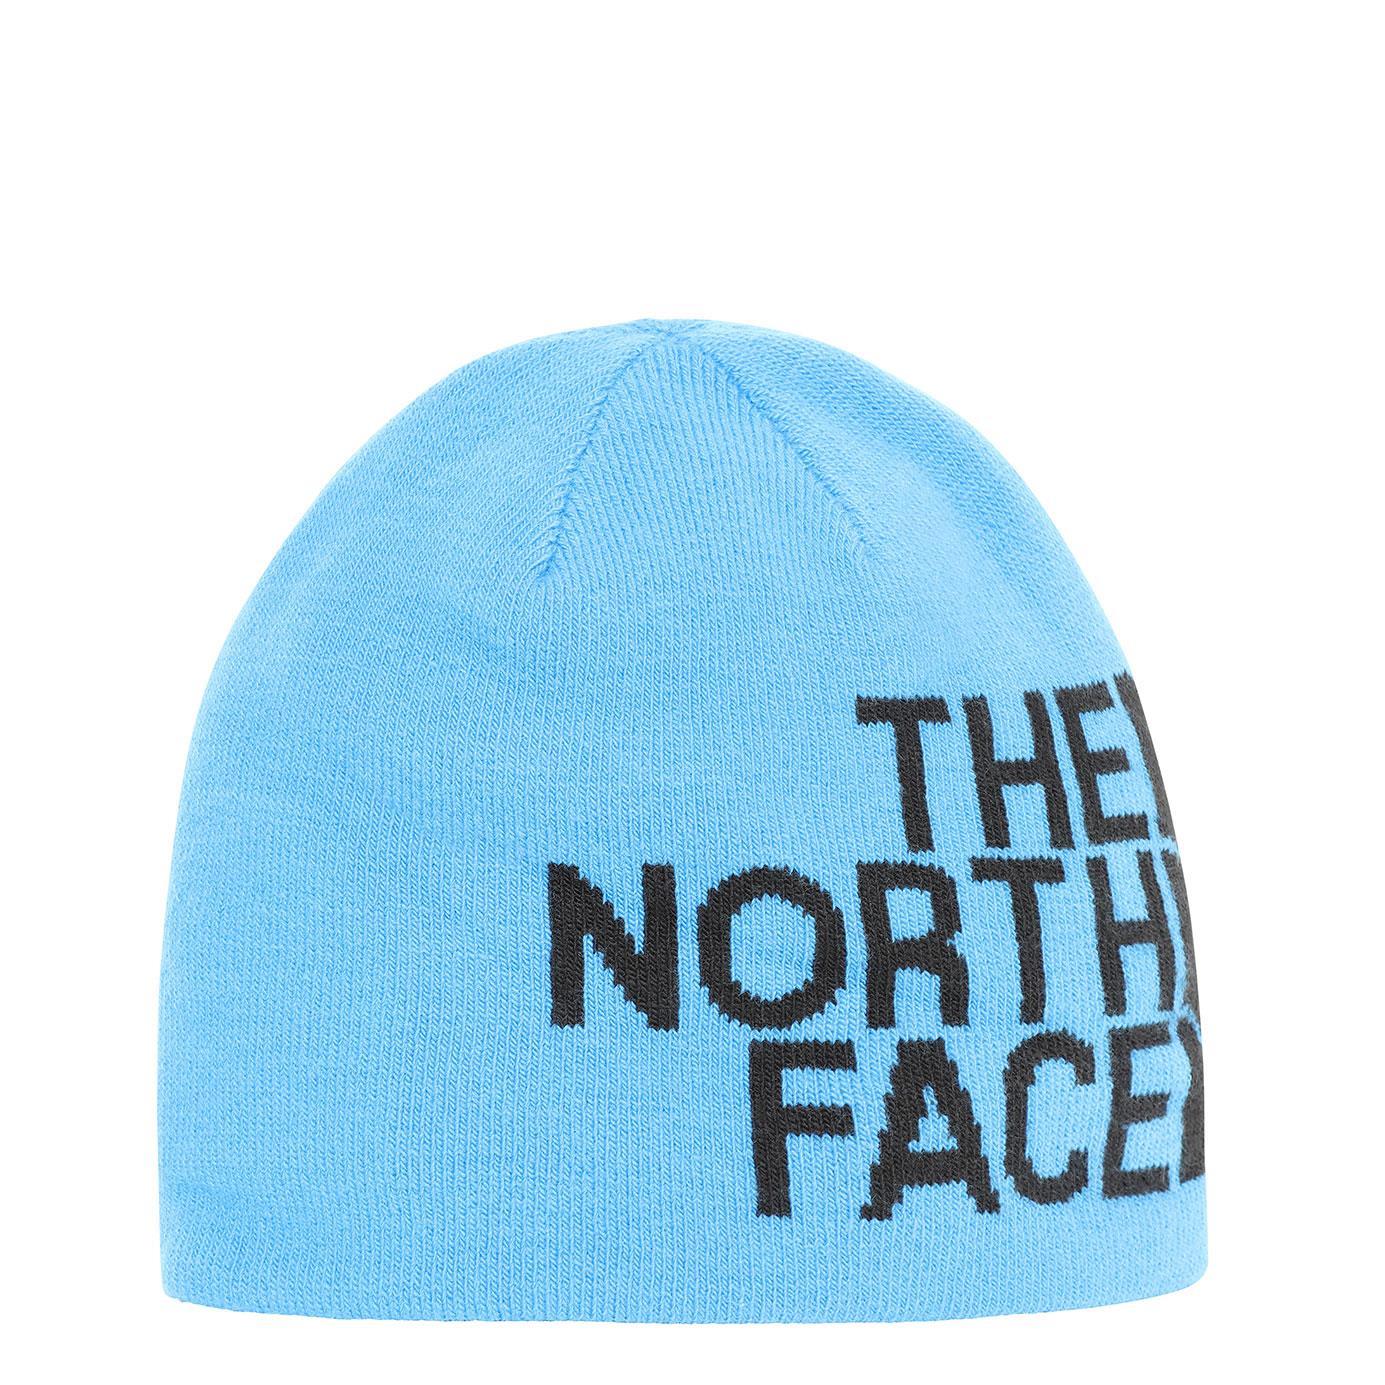 The Northface RVSBL TNF BANNER Bere NF00AKNDME91